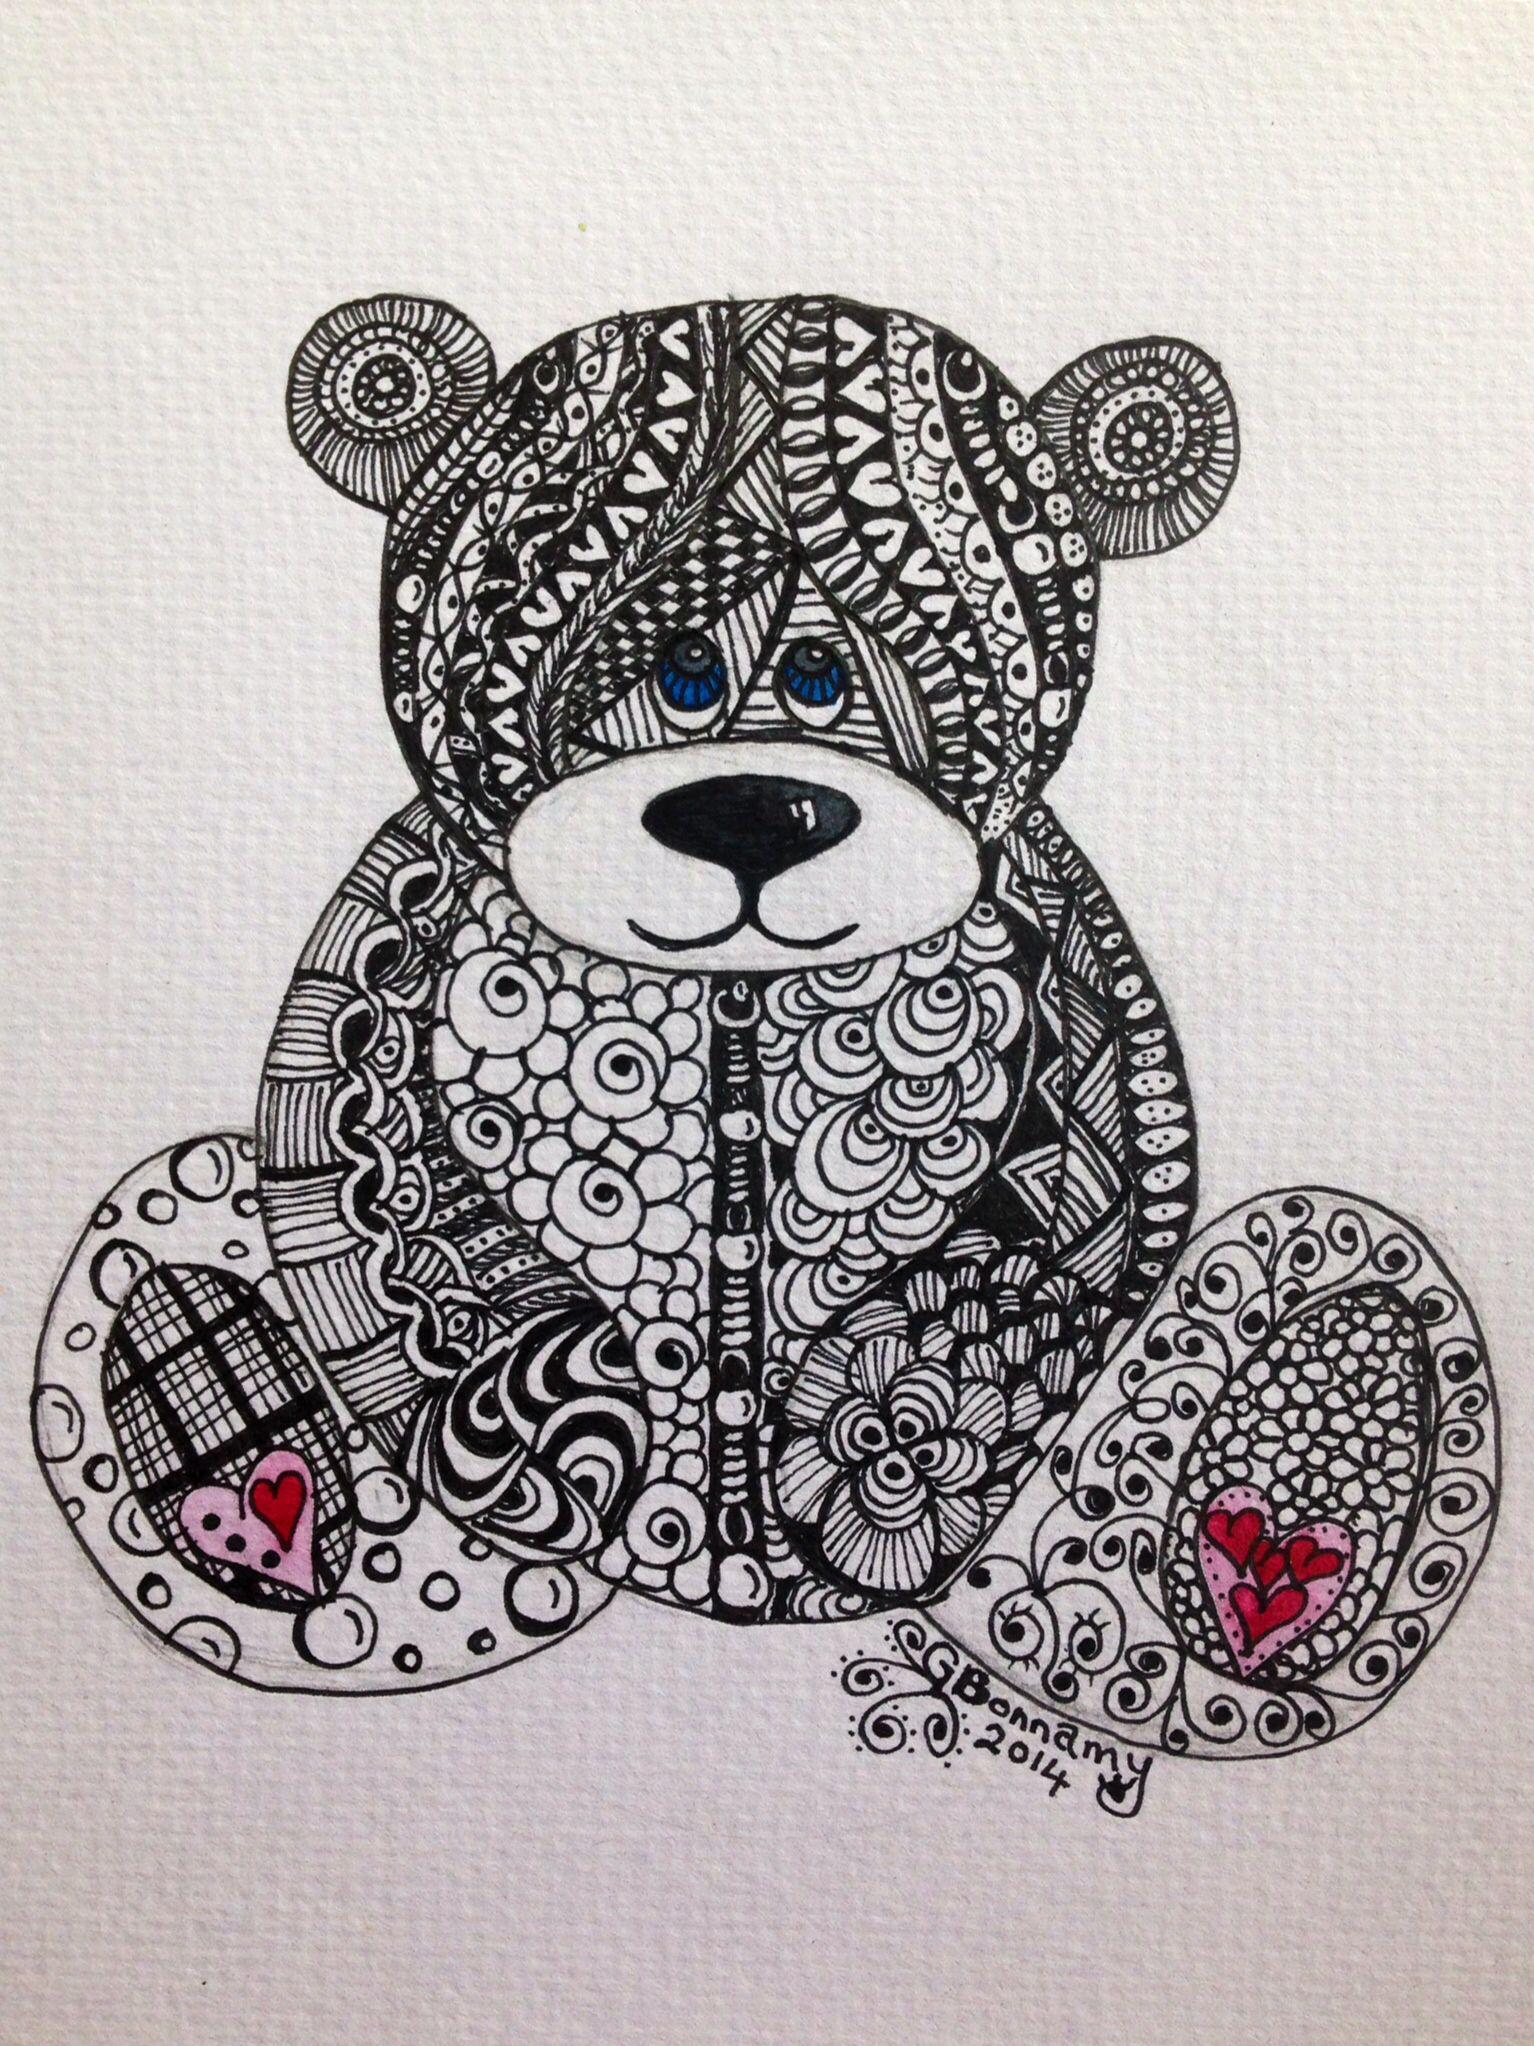 Zentangle Teddy Bear On Watercolour Paper Houtbrand Zendoodle Zentangle